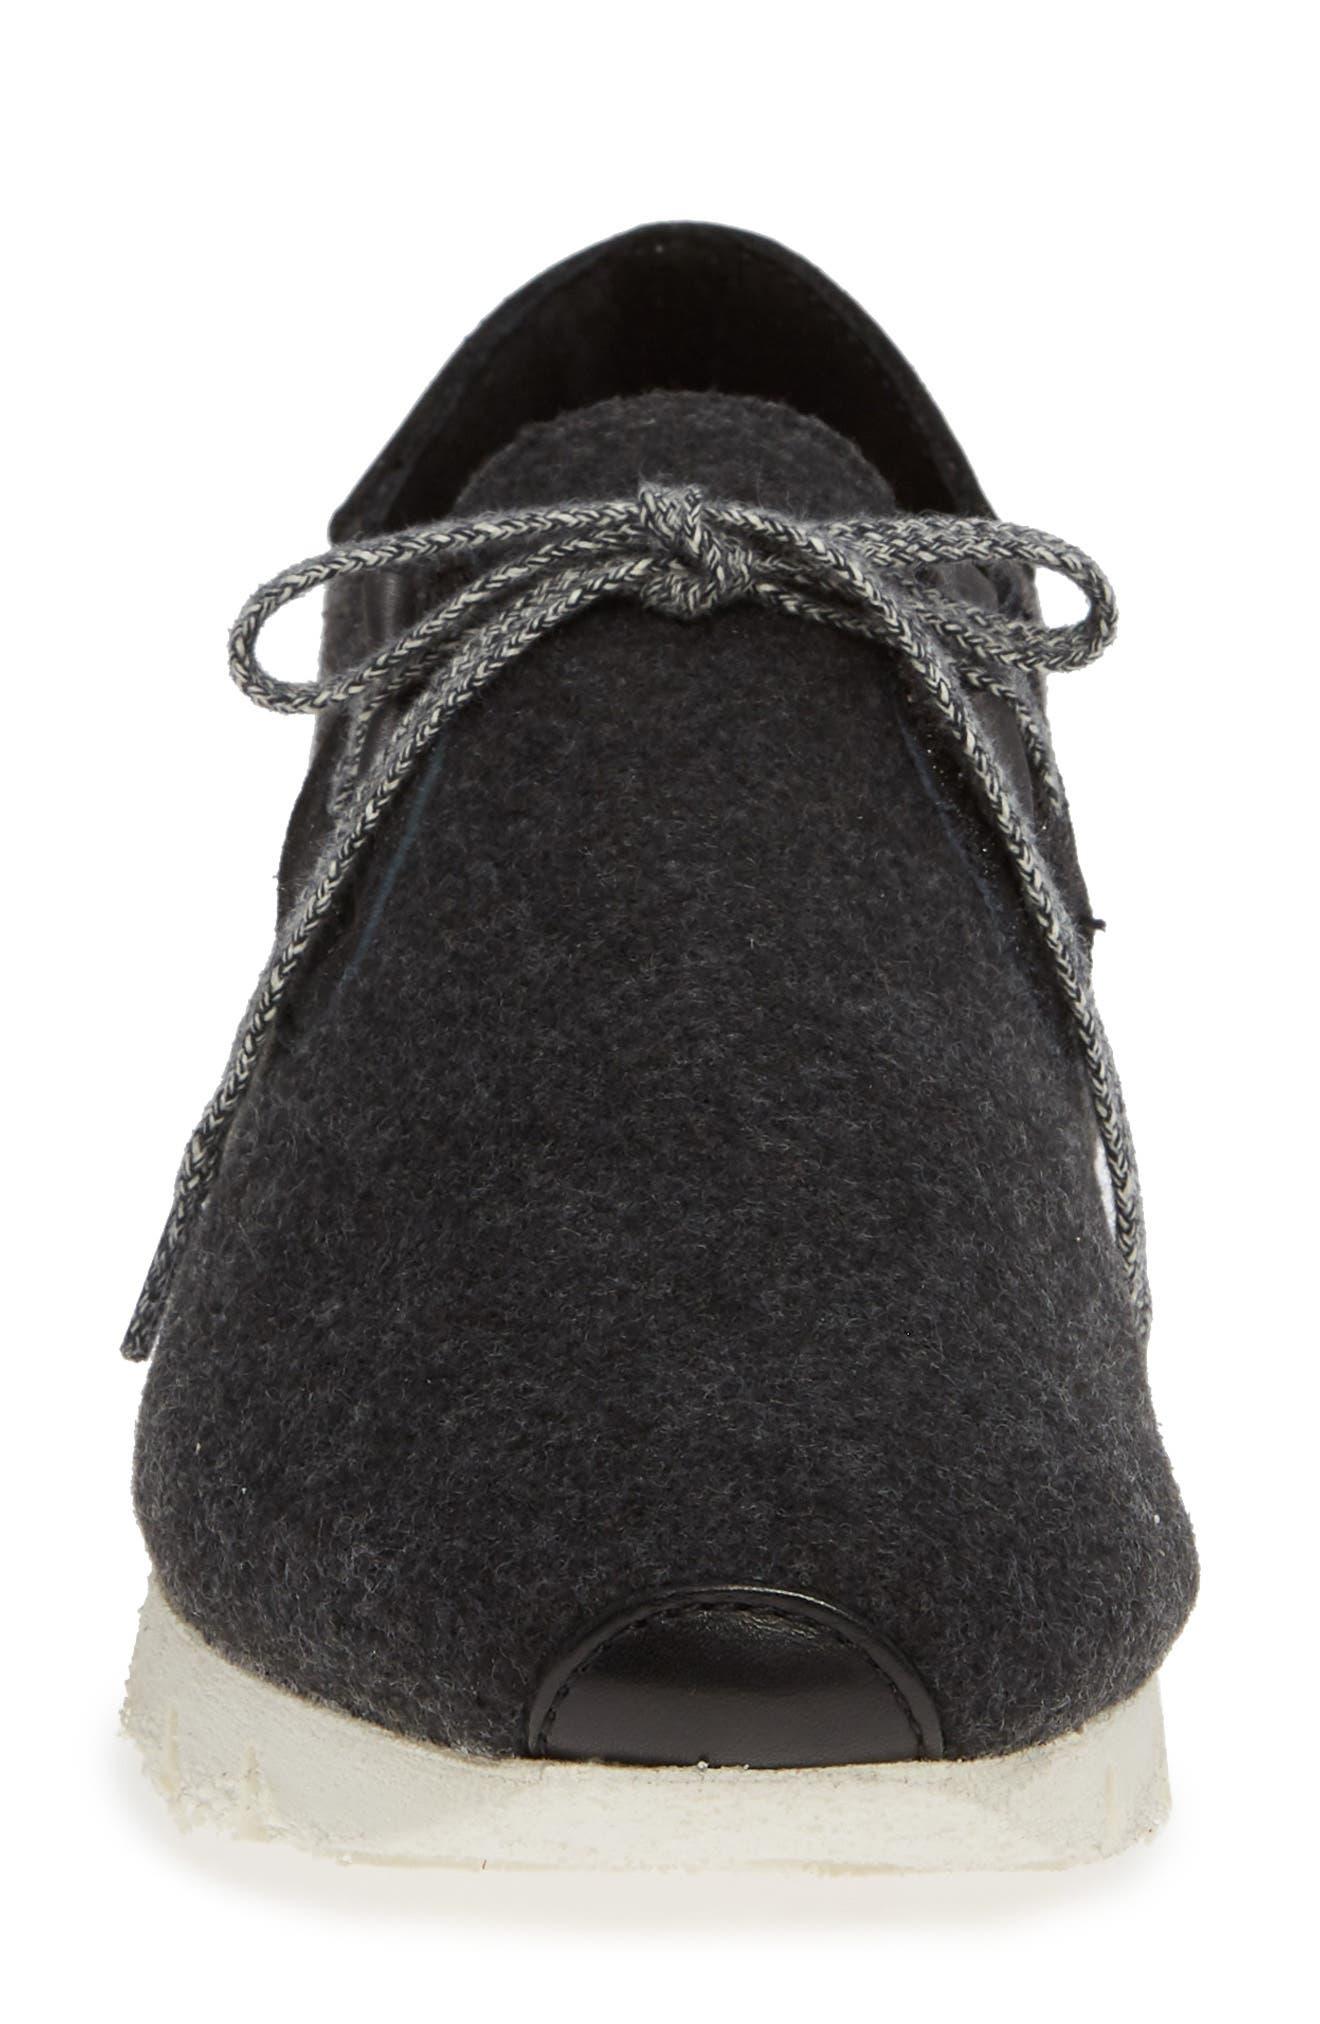 Radius Sneaker,                             Alternate thumbnail 4, color,                             CHARCOAL